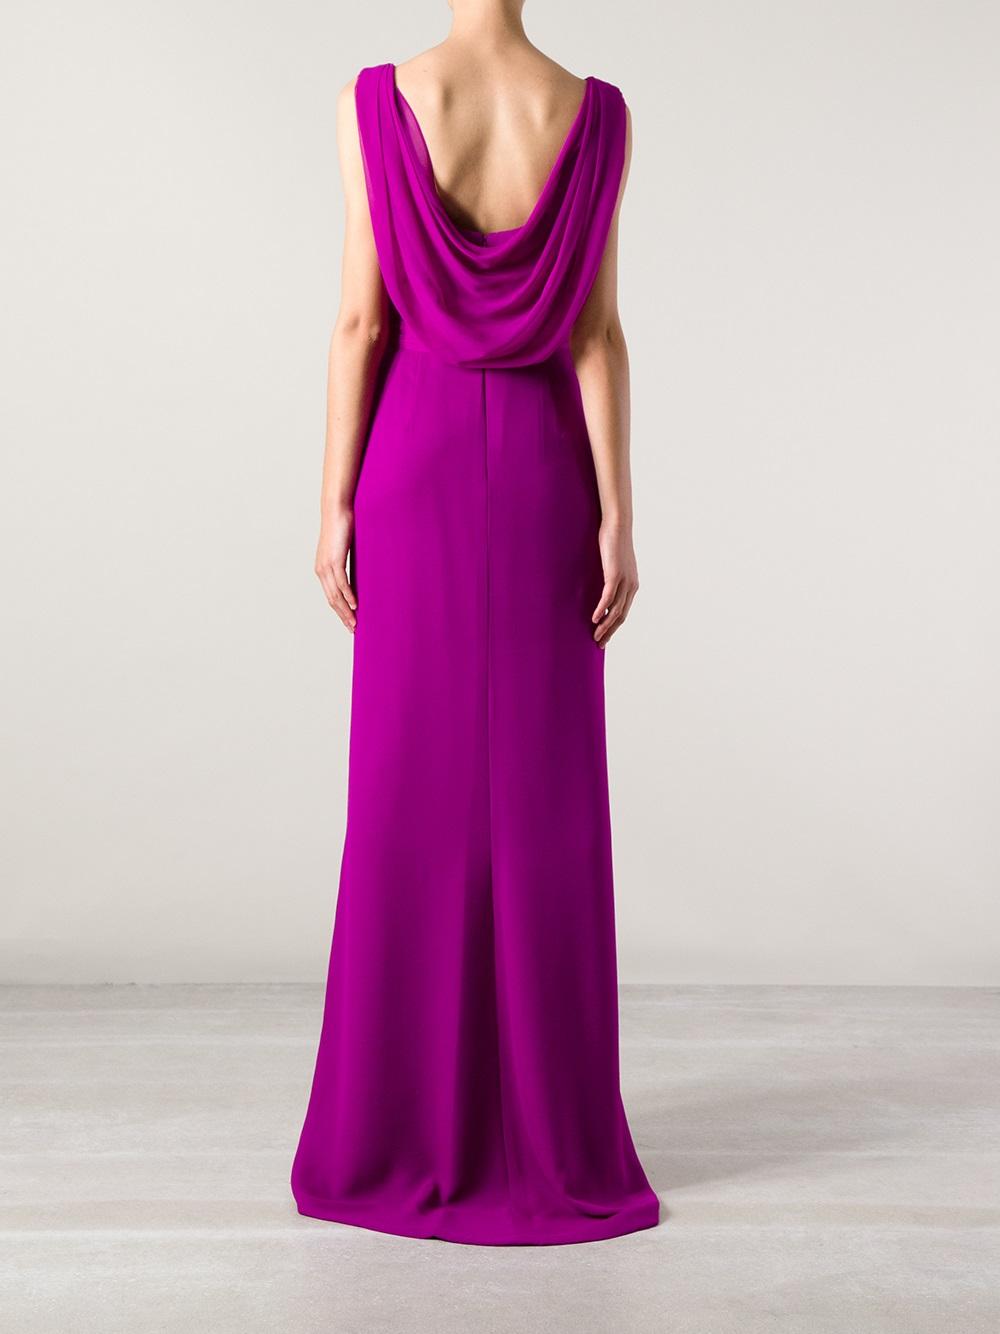 Marchesa Marchesa Embellished Evening Dress In Pink